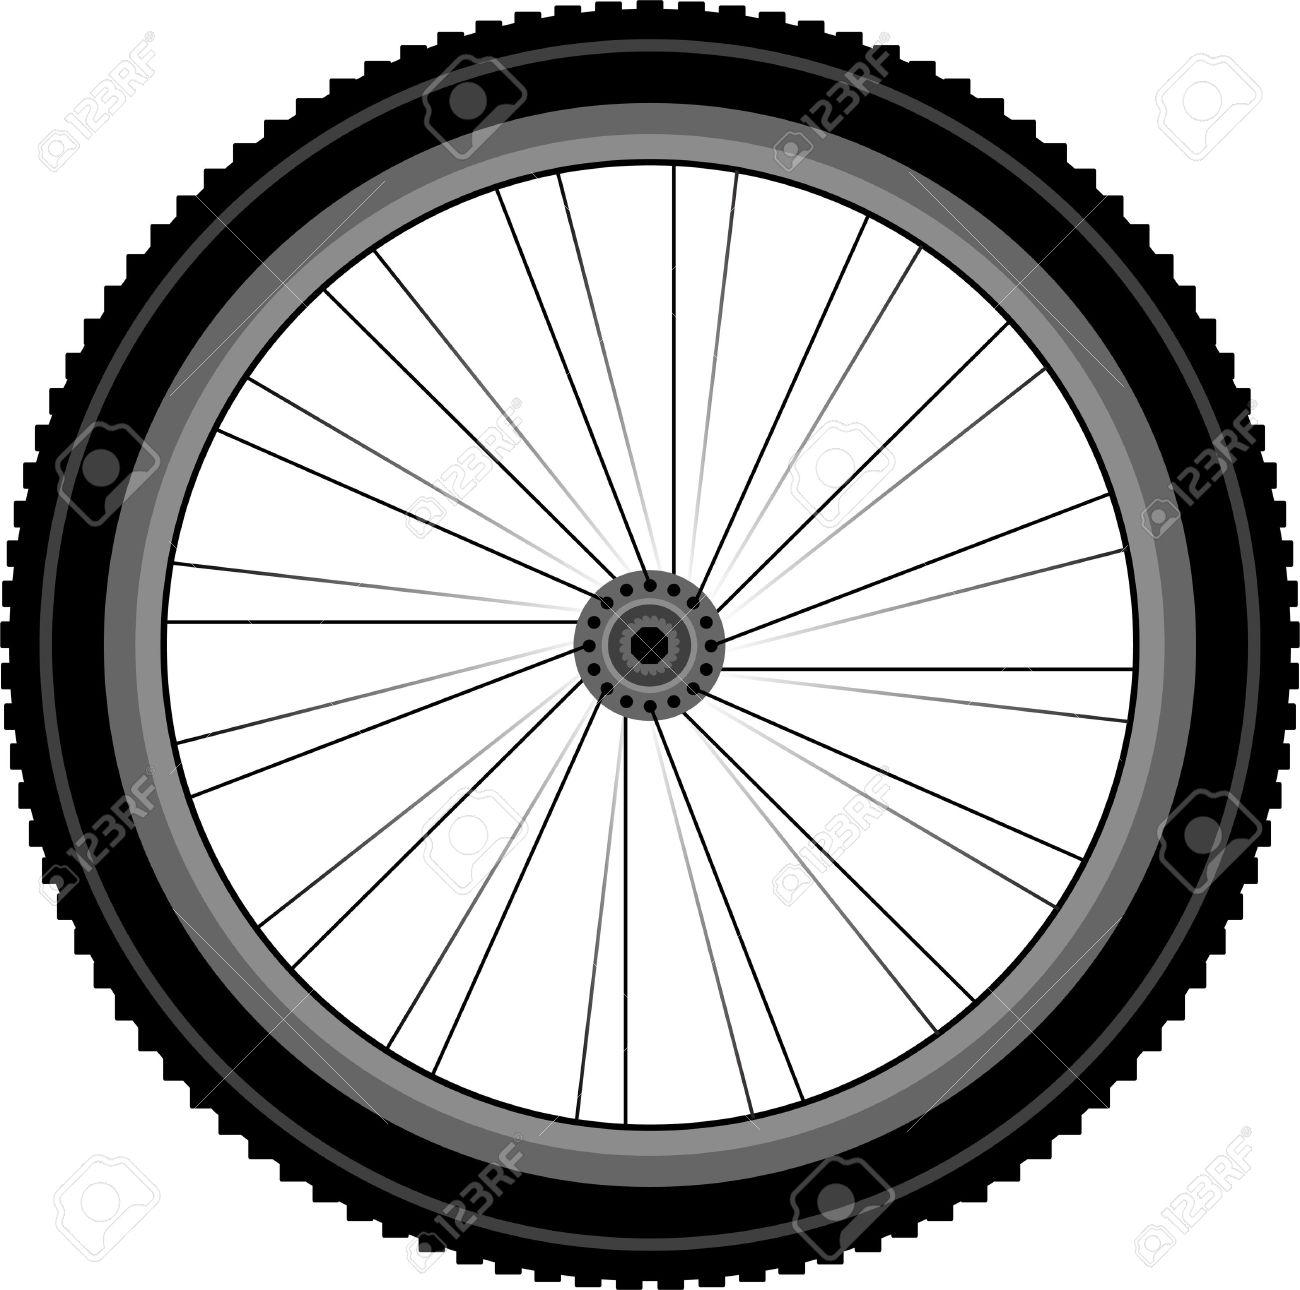 Similiar Bicycle Wheel Clip Art Keywords.